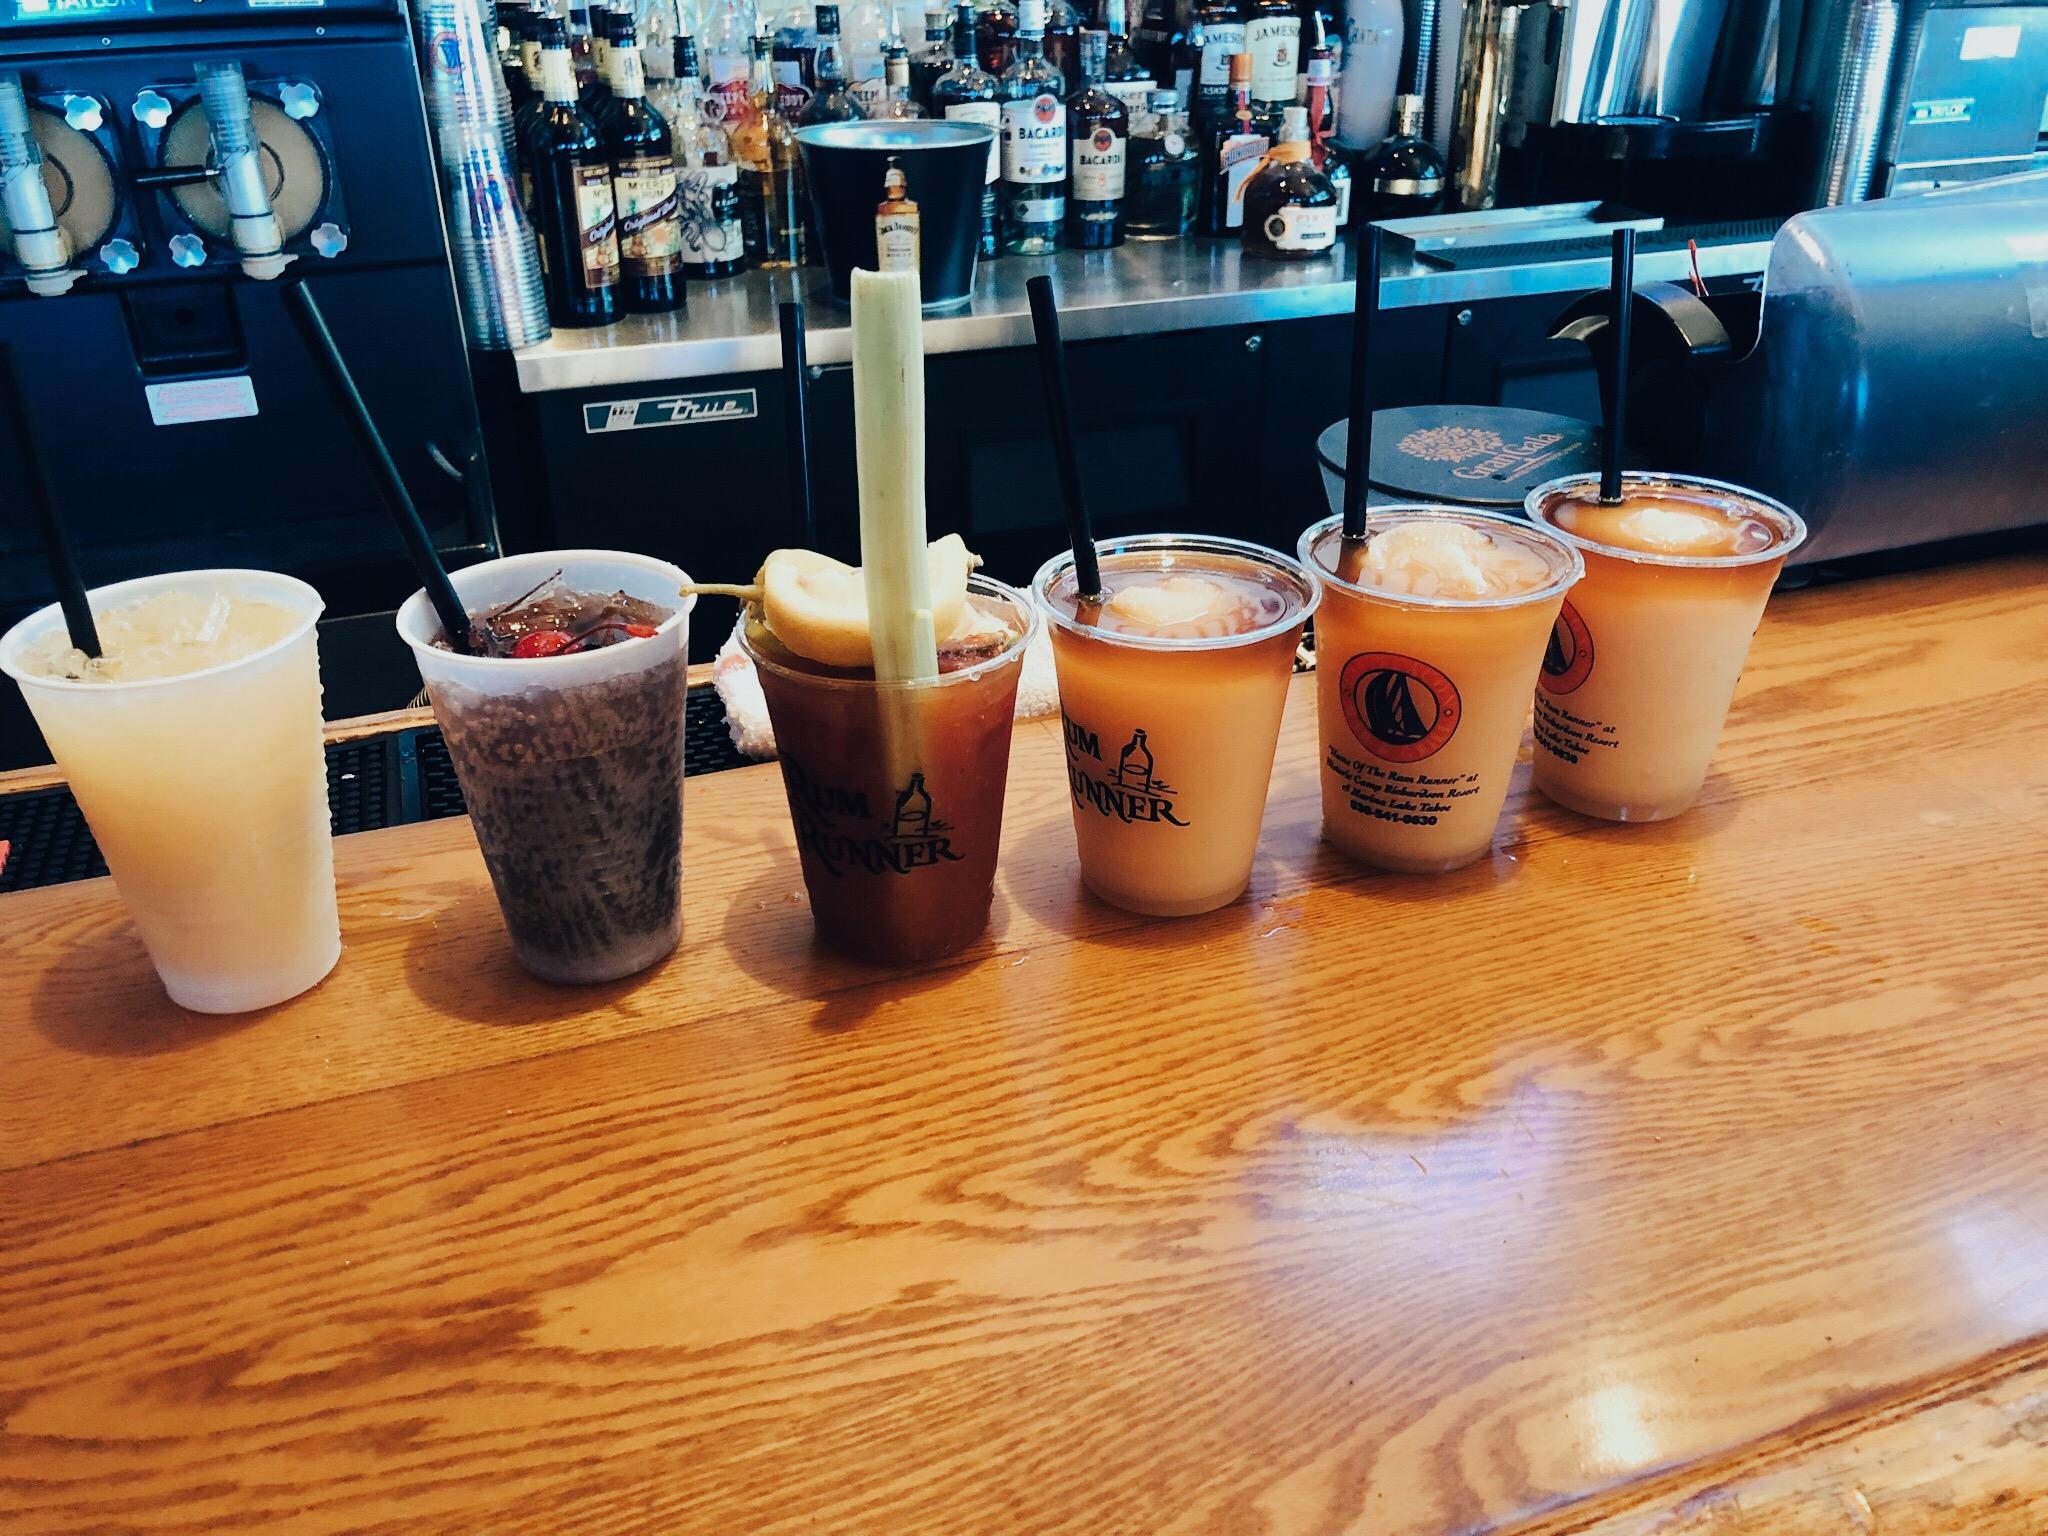 5 Best Restaurants in South Lake Tahoe